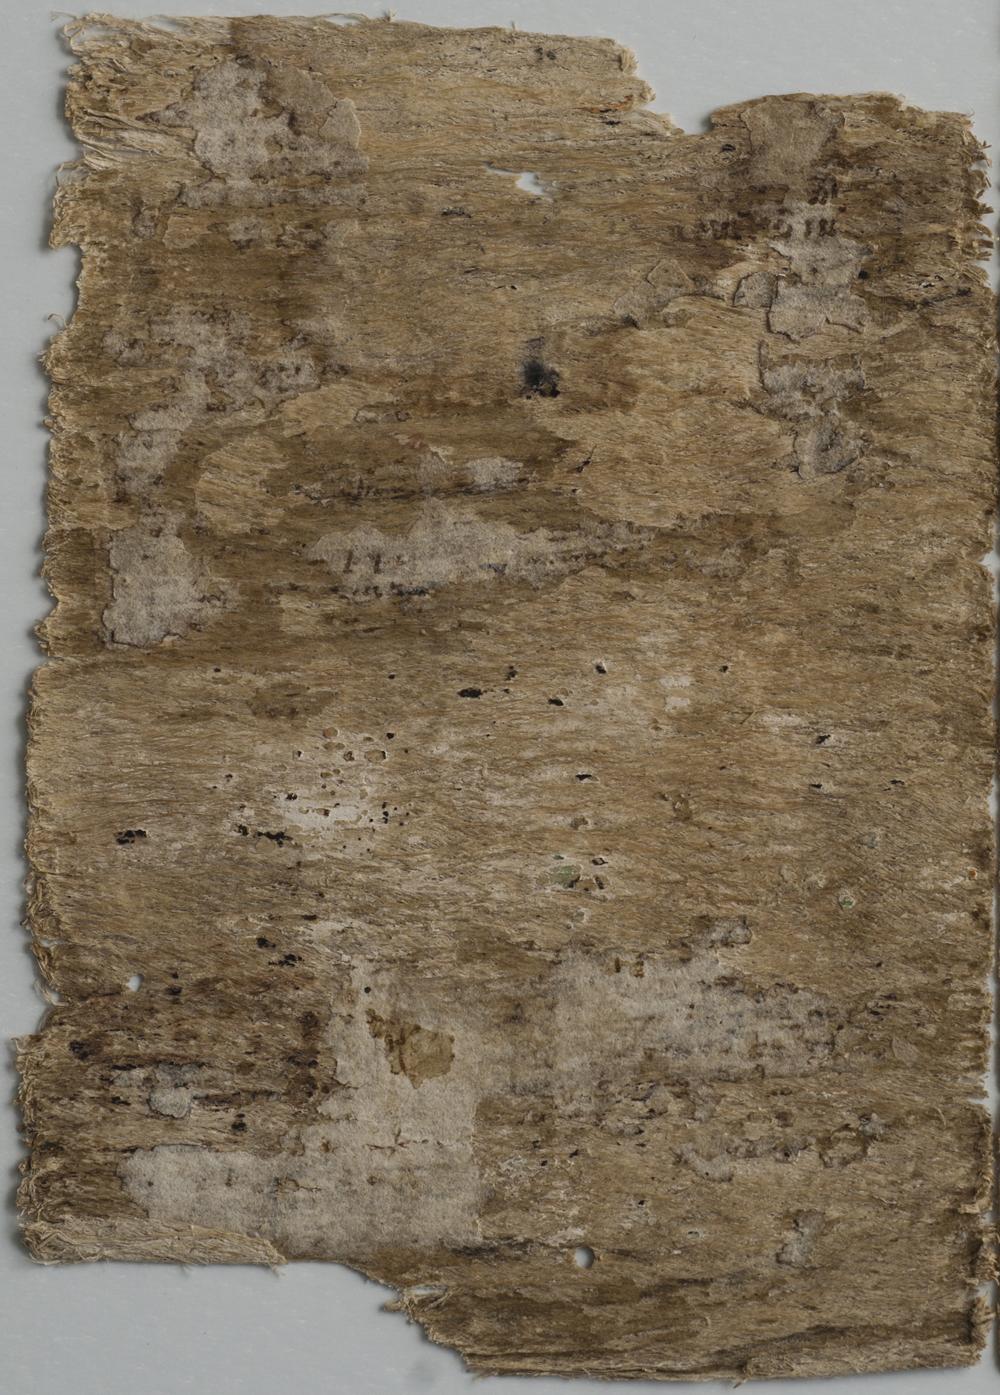 Писцовая культура у древних майя. Материал для письма. Madrid start page